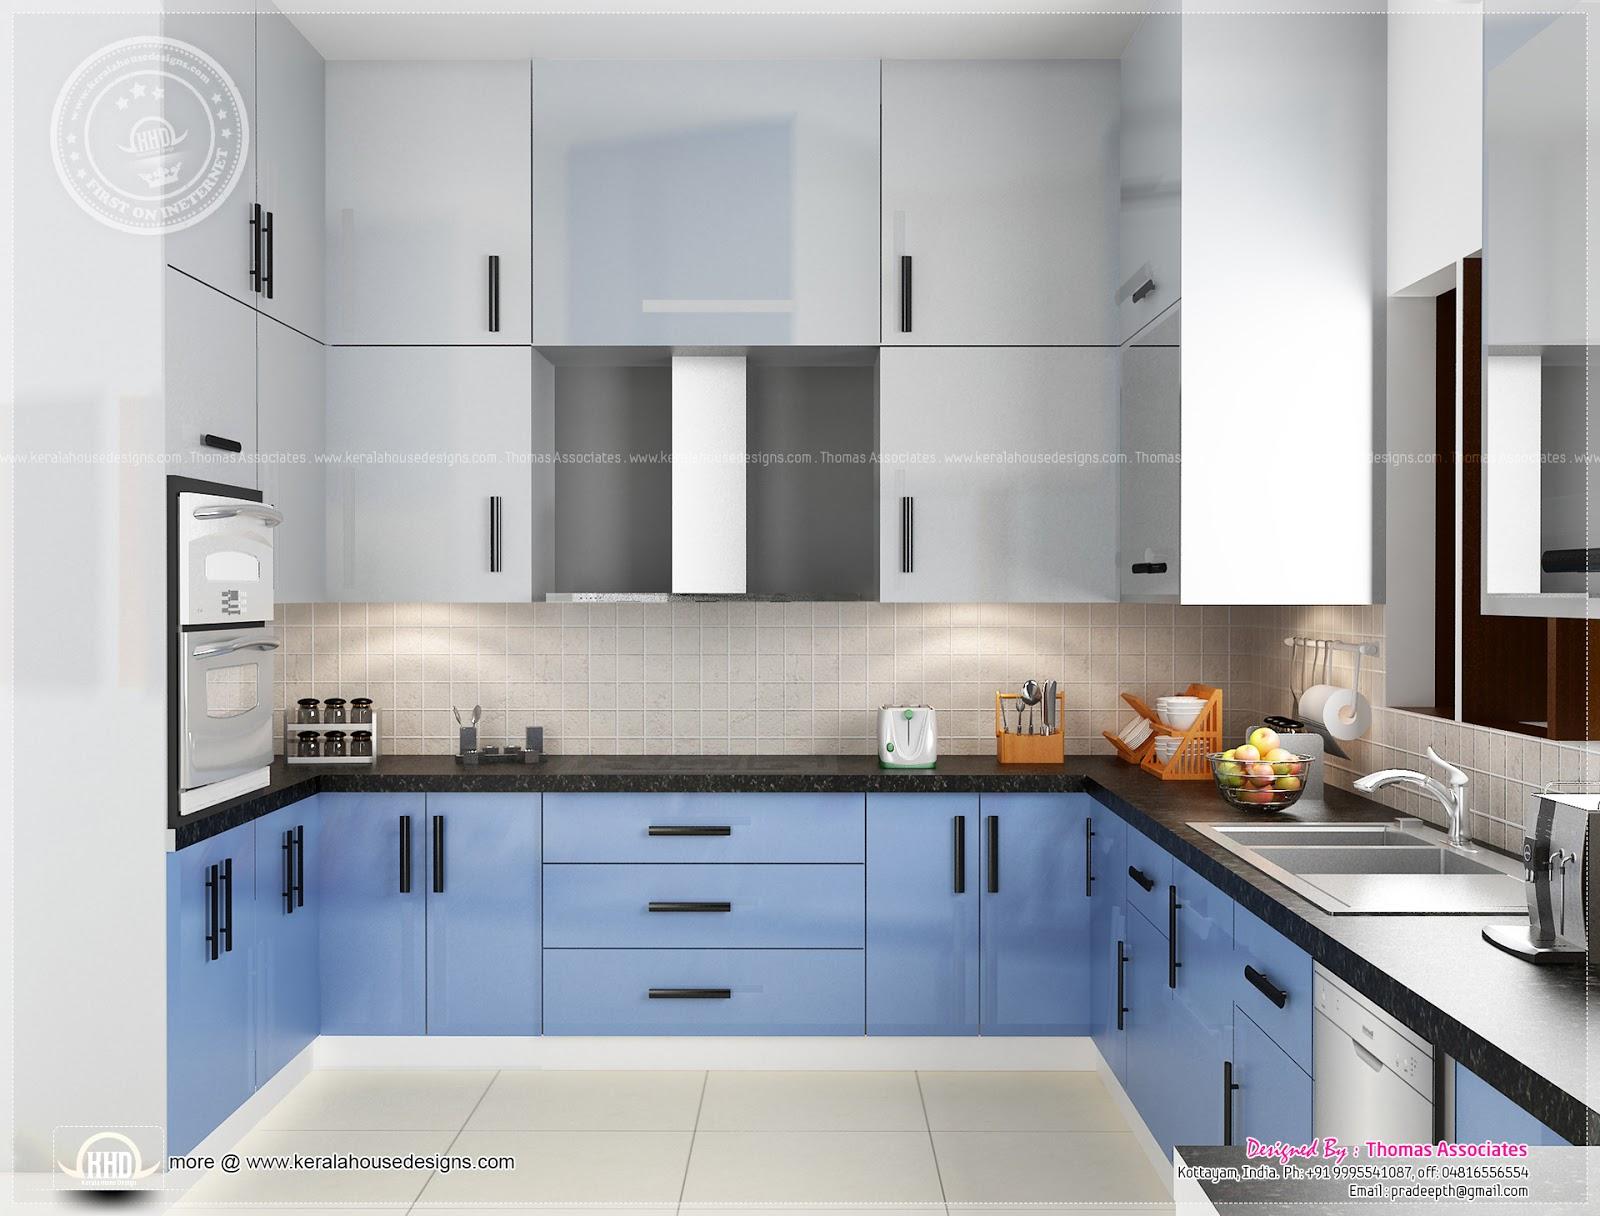 neat simple blue toned kitchen bathroom interior designs design style kitchen designs tagged kitchen interior design